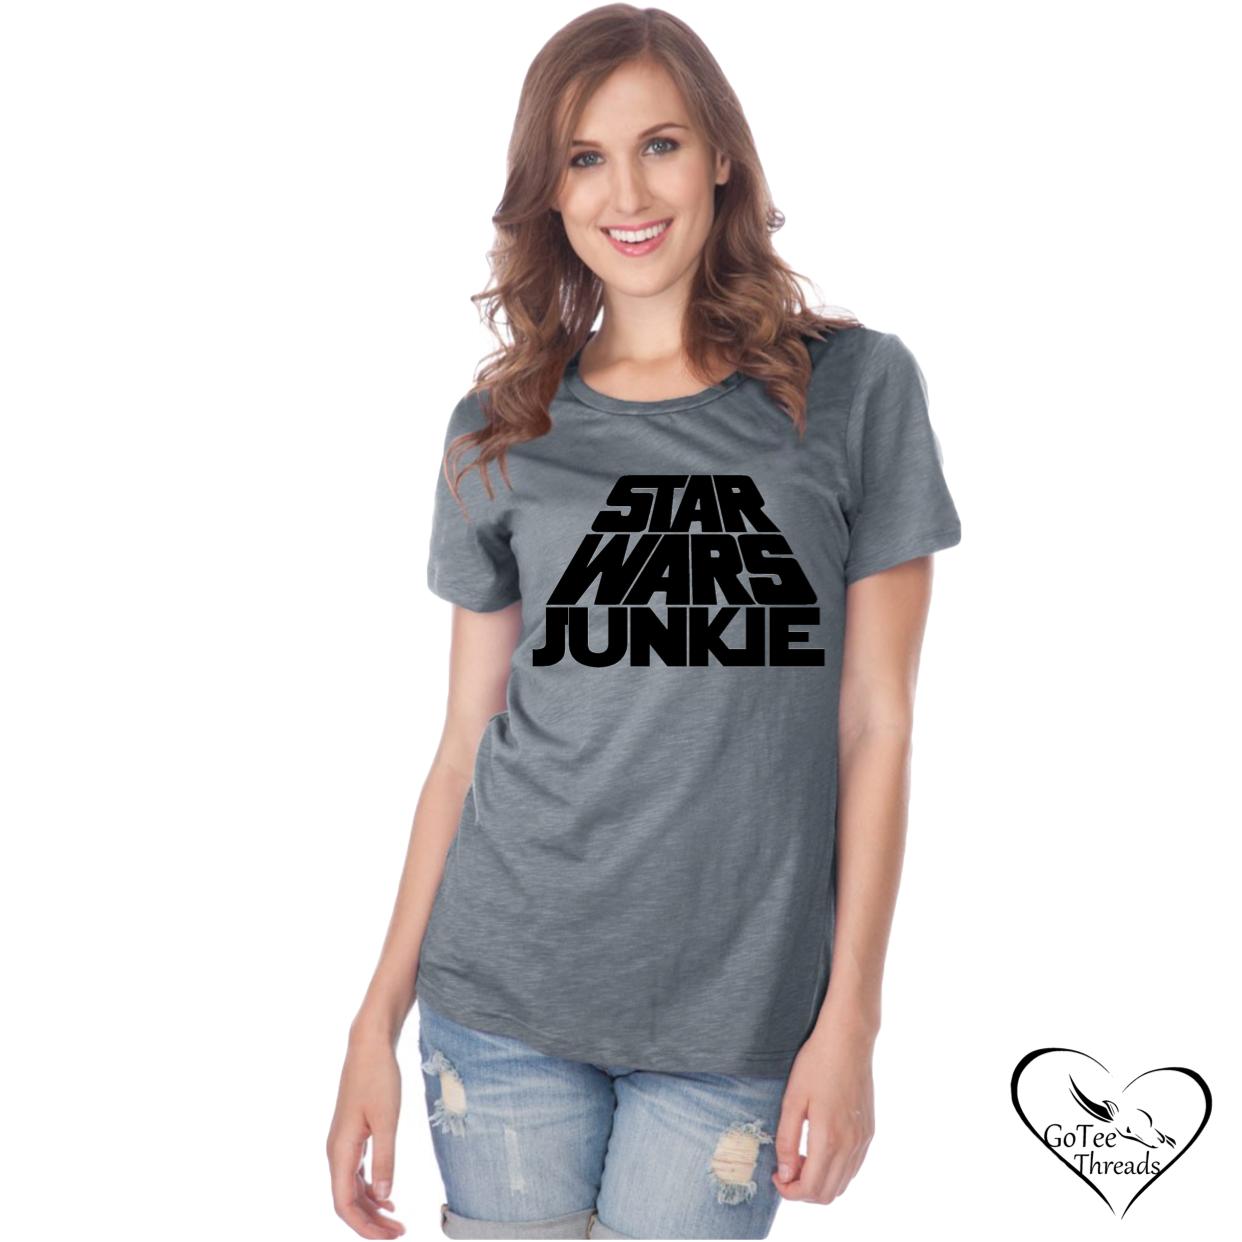 Star Wars Junkie Mens Womens Adult Tee Shirt